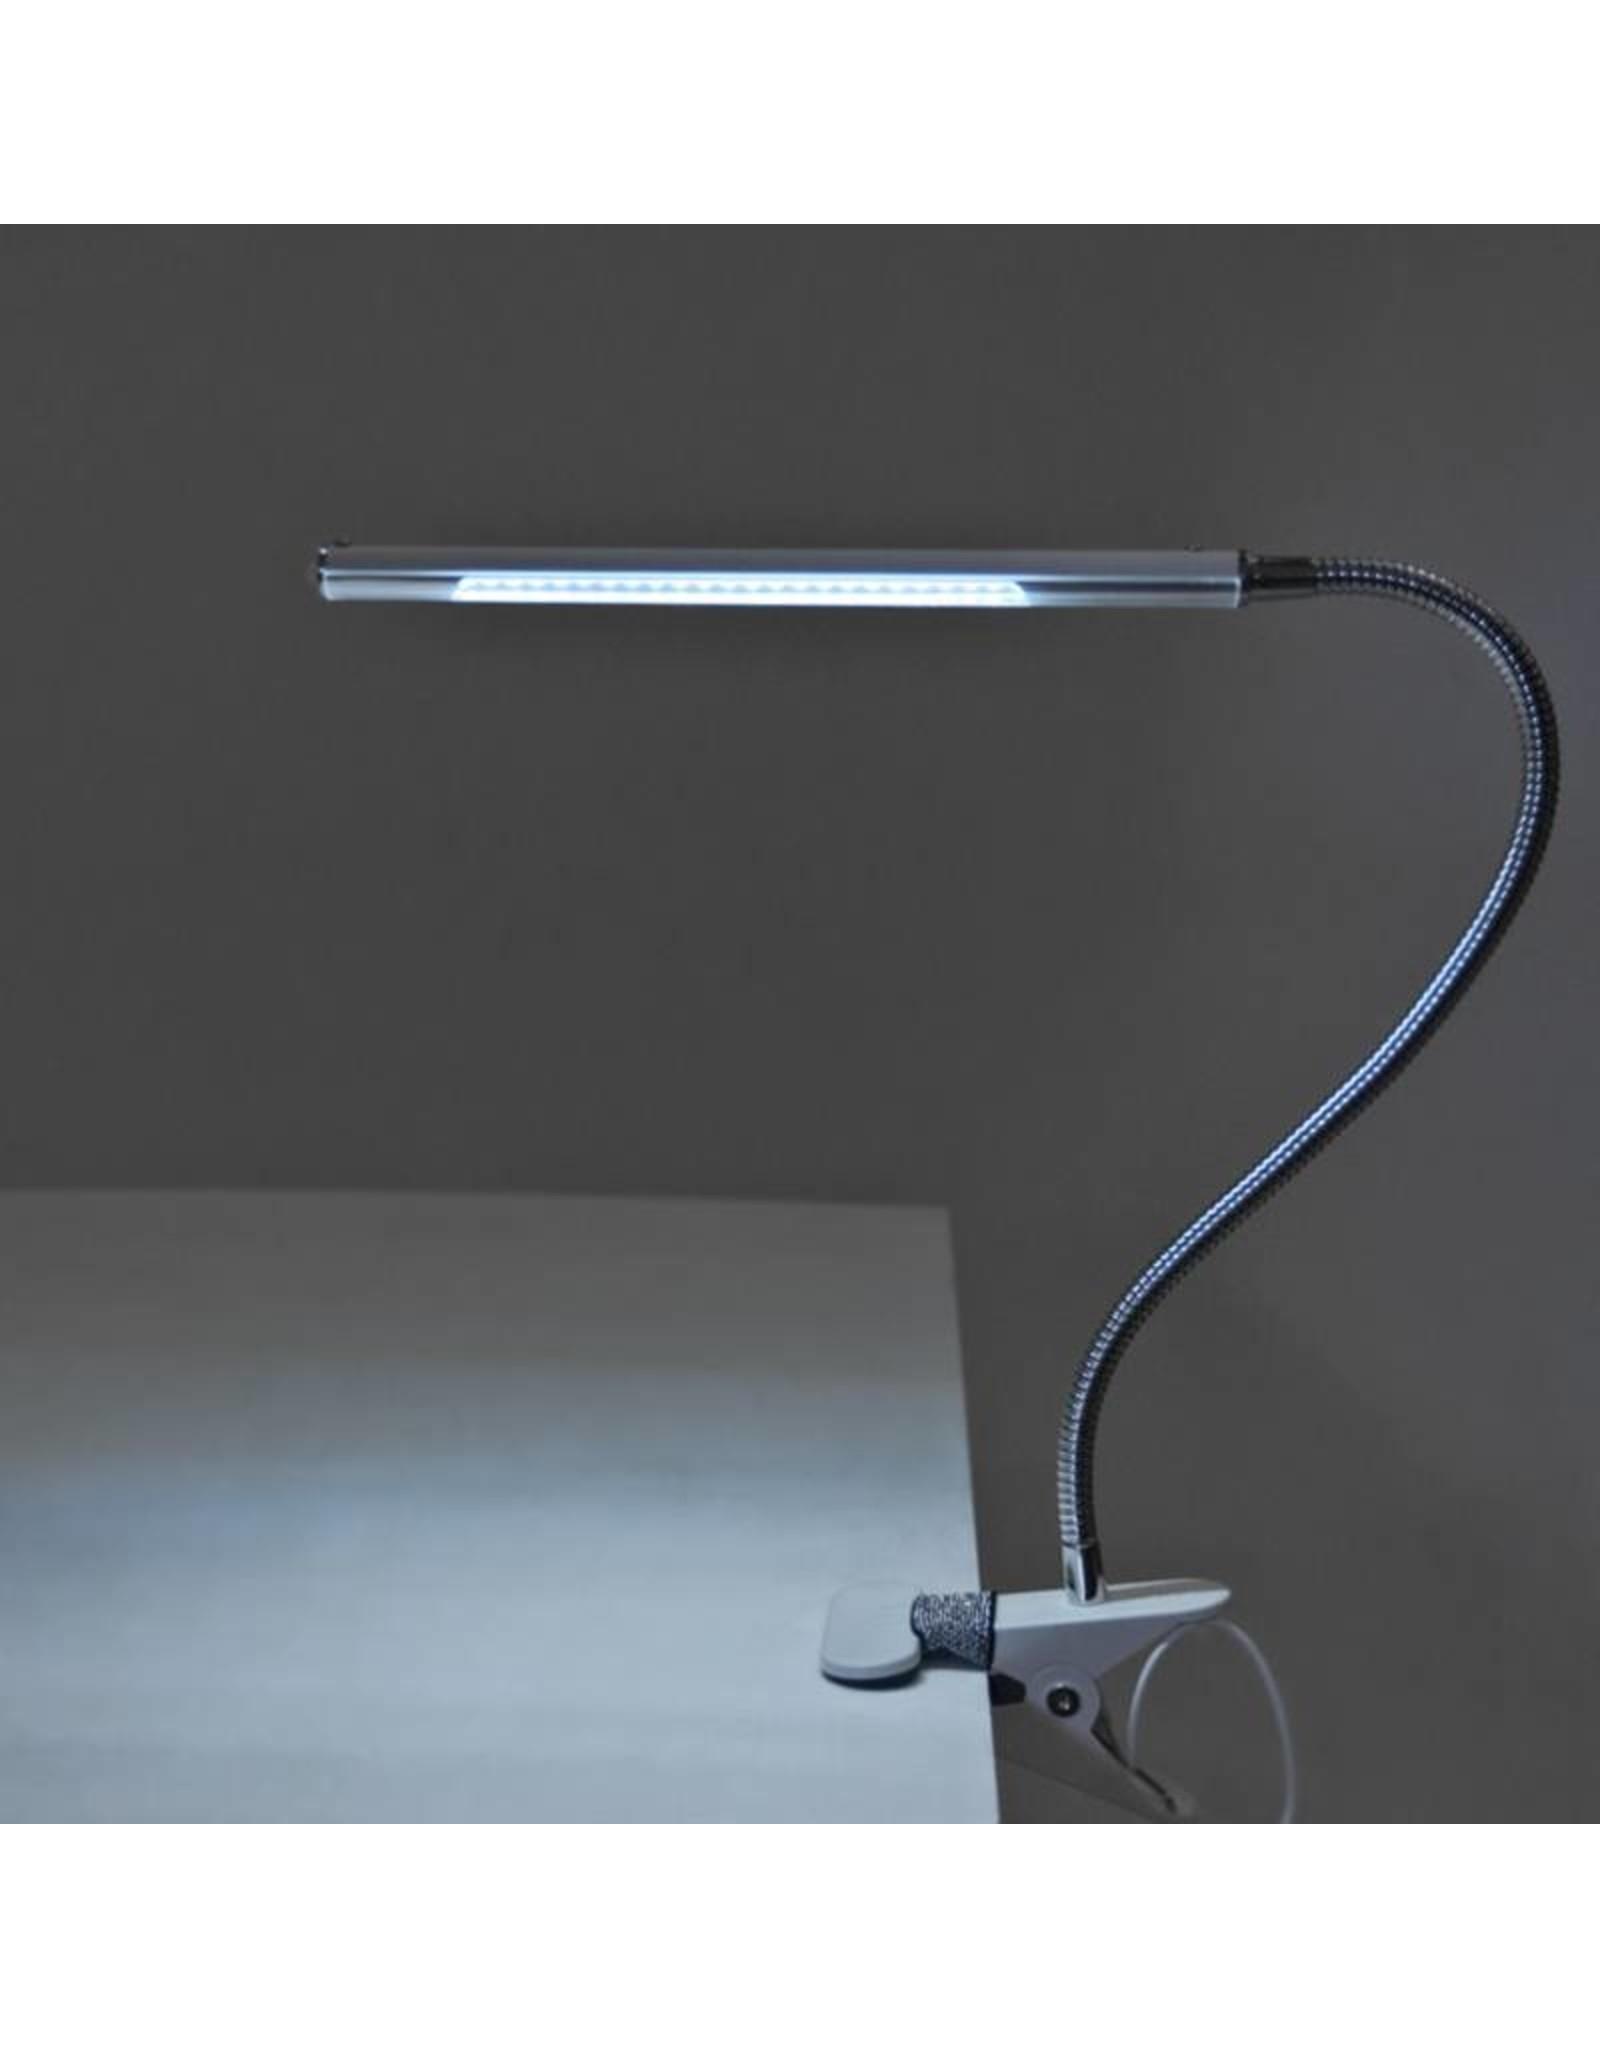 Mega Beauty Shop® LED Tafellamp Zwart met een flexibele arm op tafelklem.